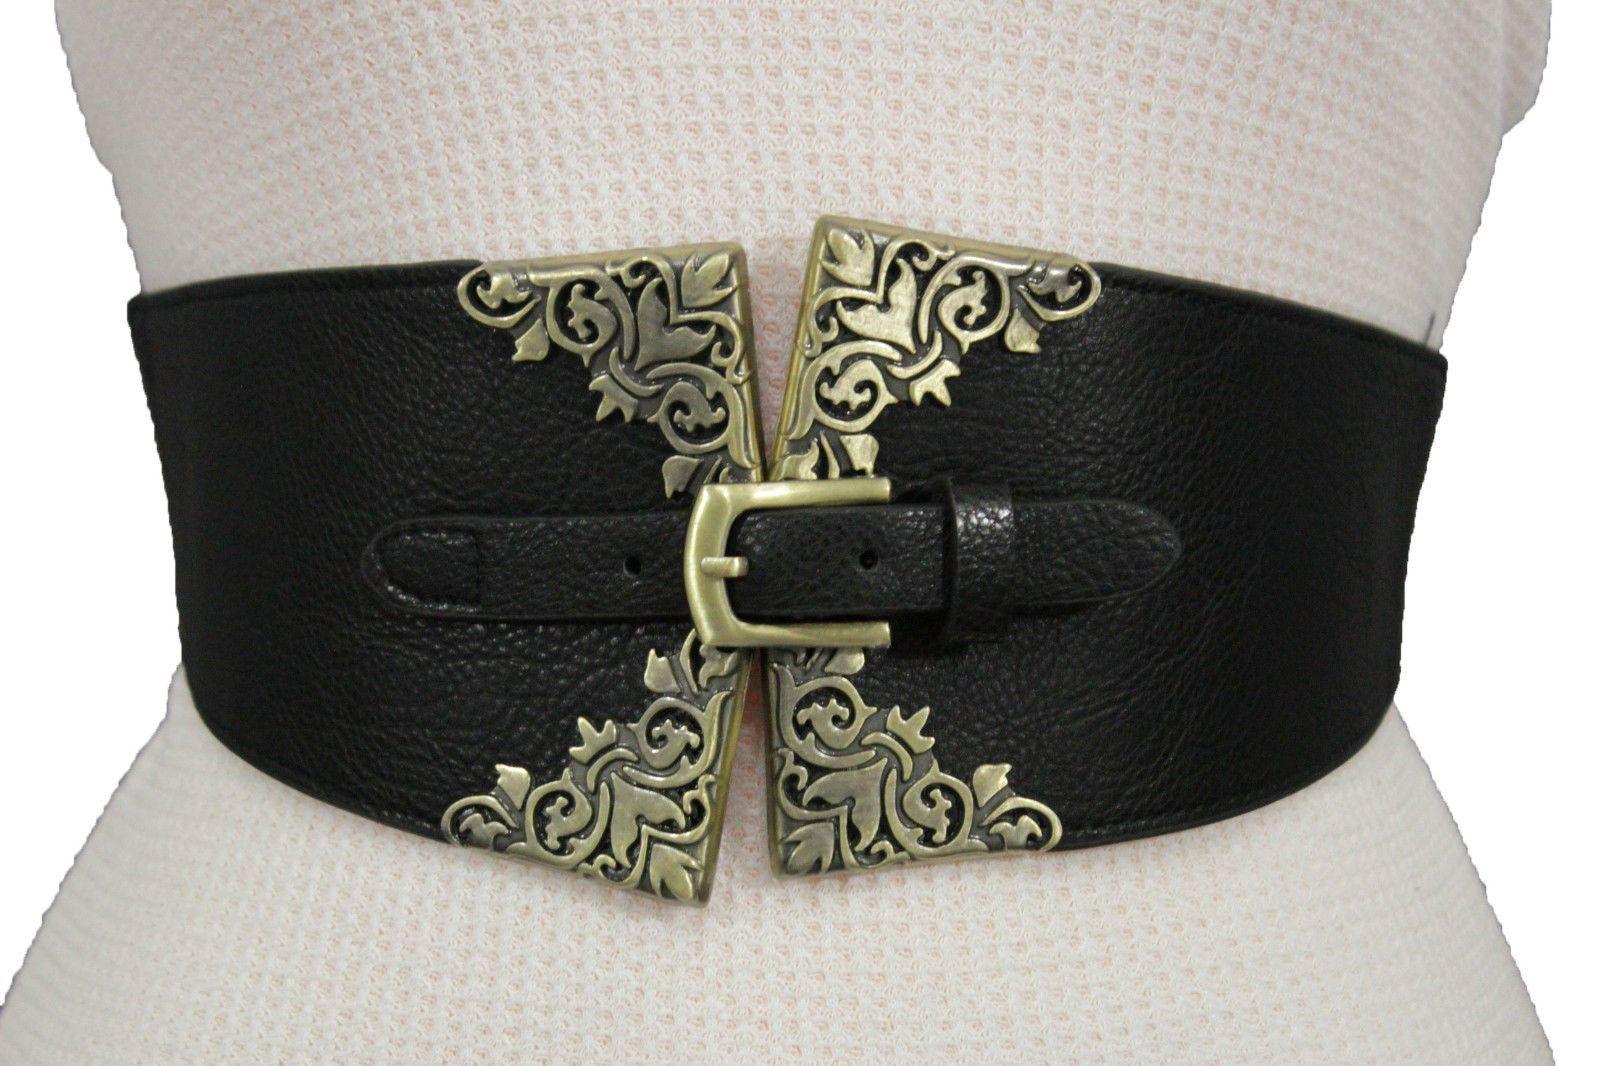 252b973a5f Black Faux Leather Stretch Back Wide Corset Hip Waist Belt Antique Gold  Buckle Flower New Women Fashion Accessories XS S